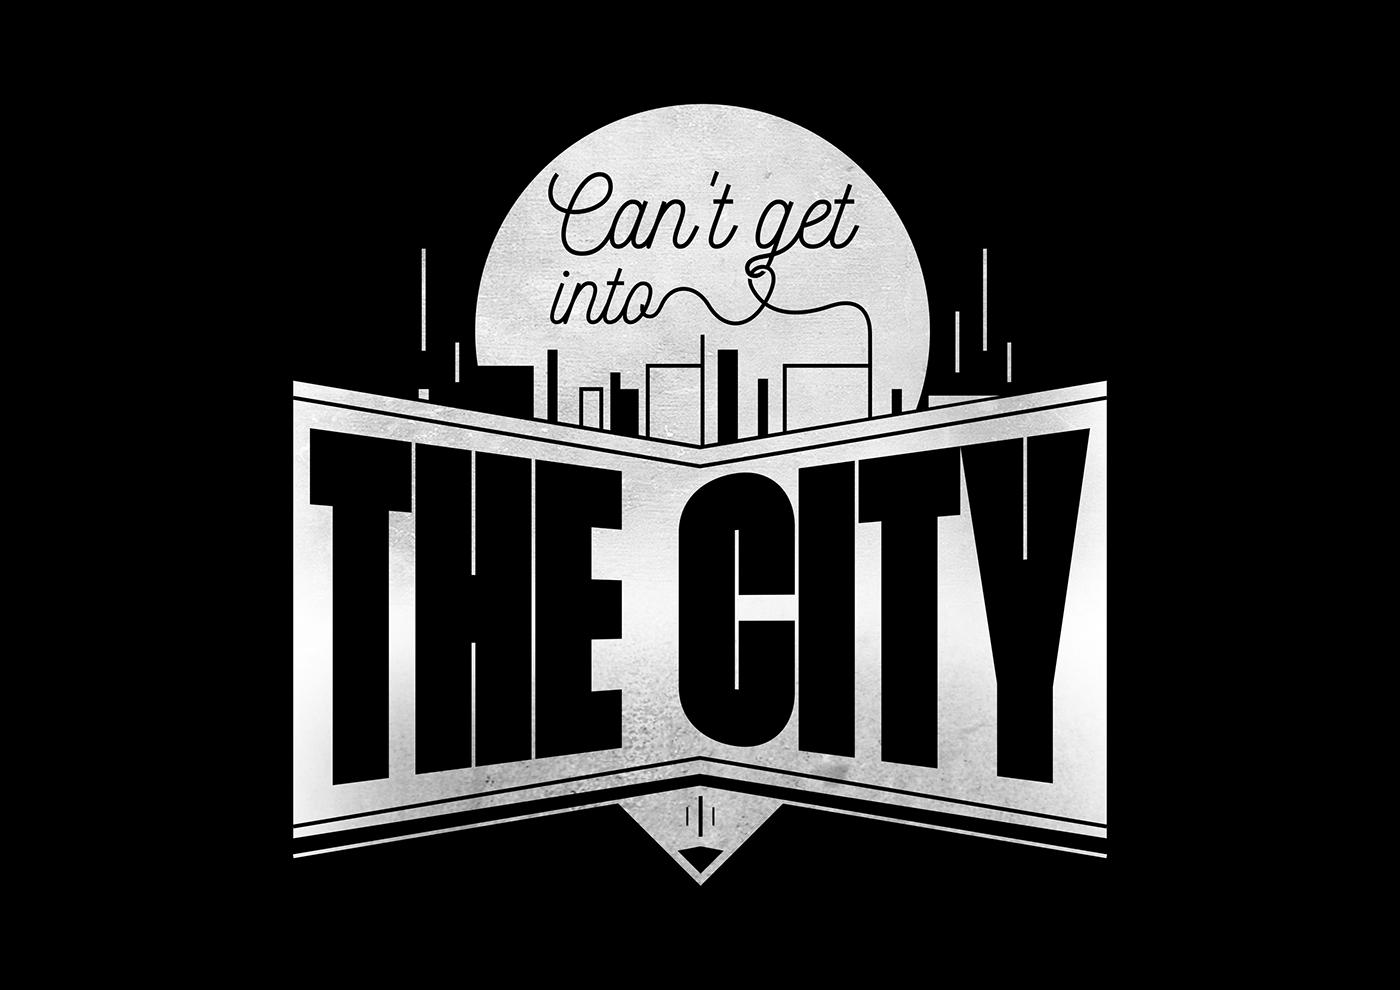 type Hipster village redneck dirty grunge soft city beer creative